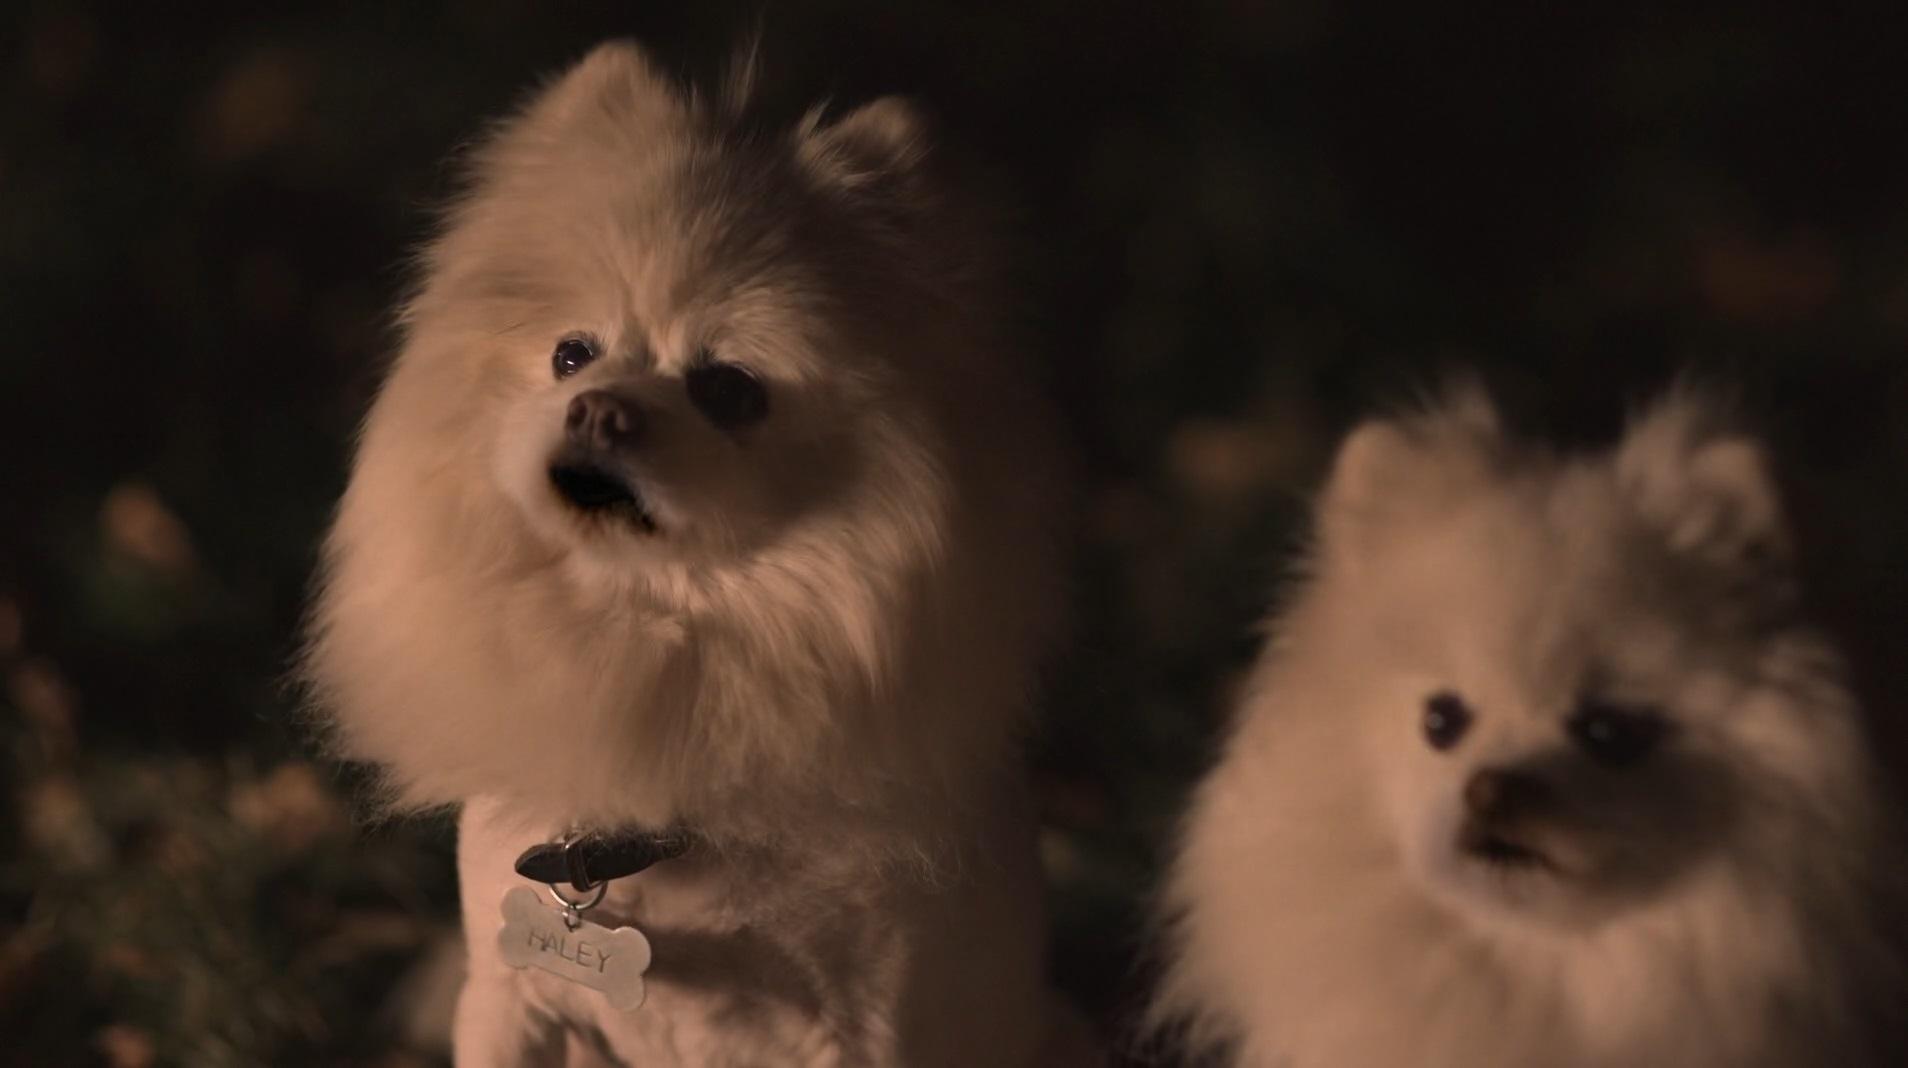 İkiz Patiler   Puppy Swap: Love Unleashed   2019   WEB-DL   XviD   Türkçe Dublaj   m720p - m1080p   WEB-DL   Dual   TR-EN   Tek Link